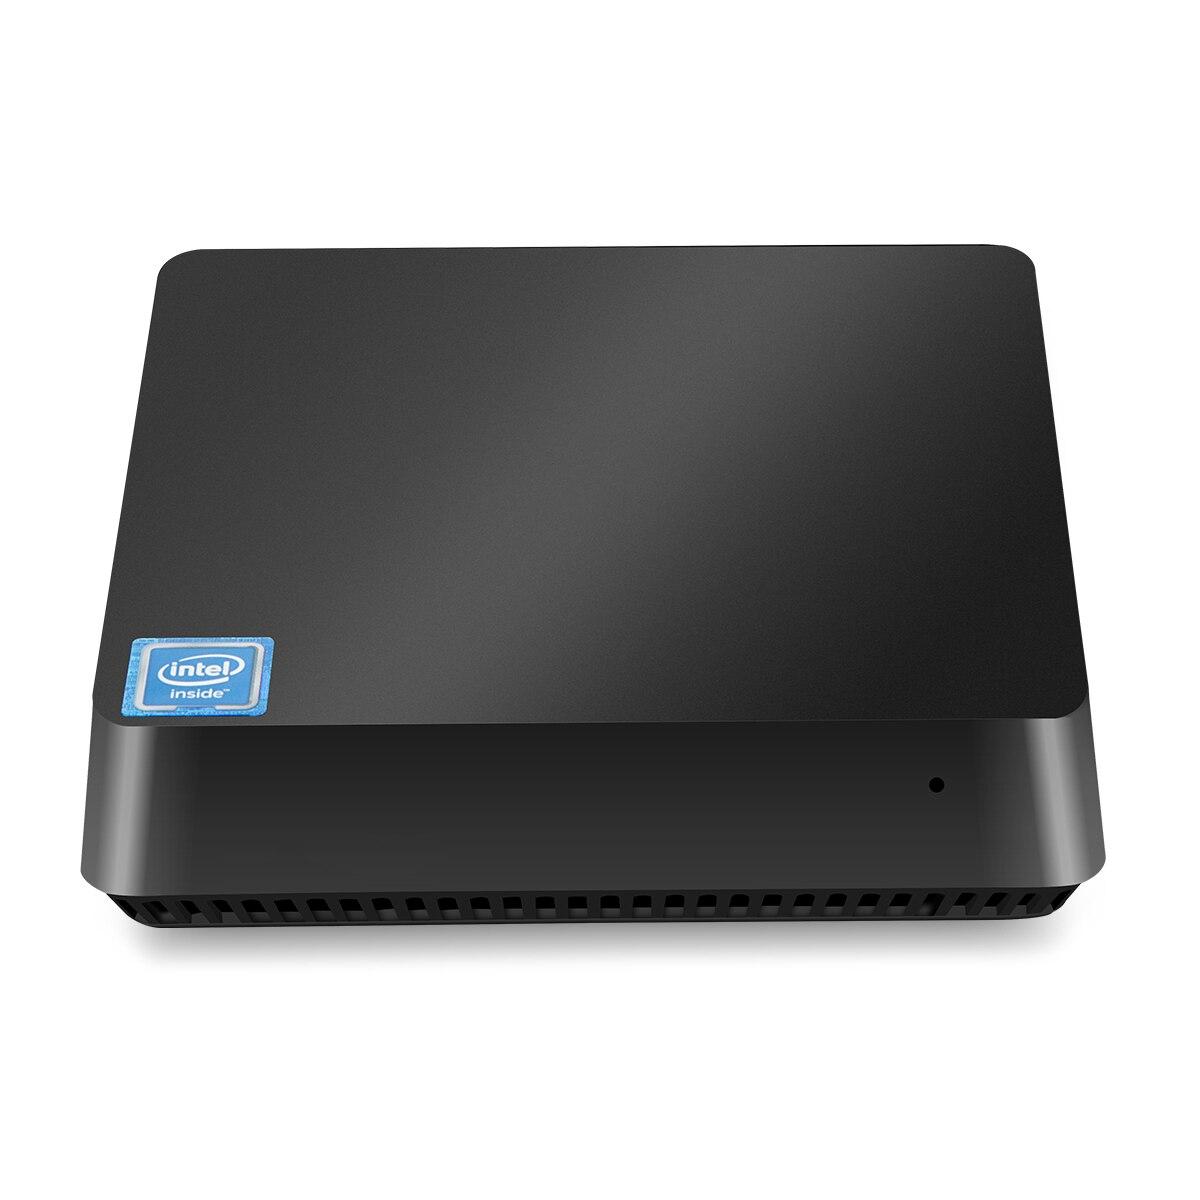 T11 Mini PC Computer 4GB/64GB Intel Cherry Atom Z8350 VGA Expandable 4k Band WiFi